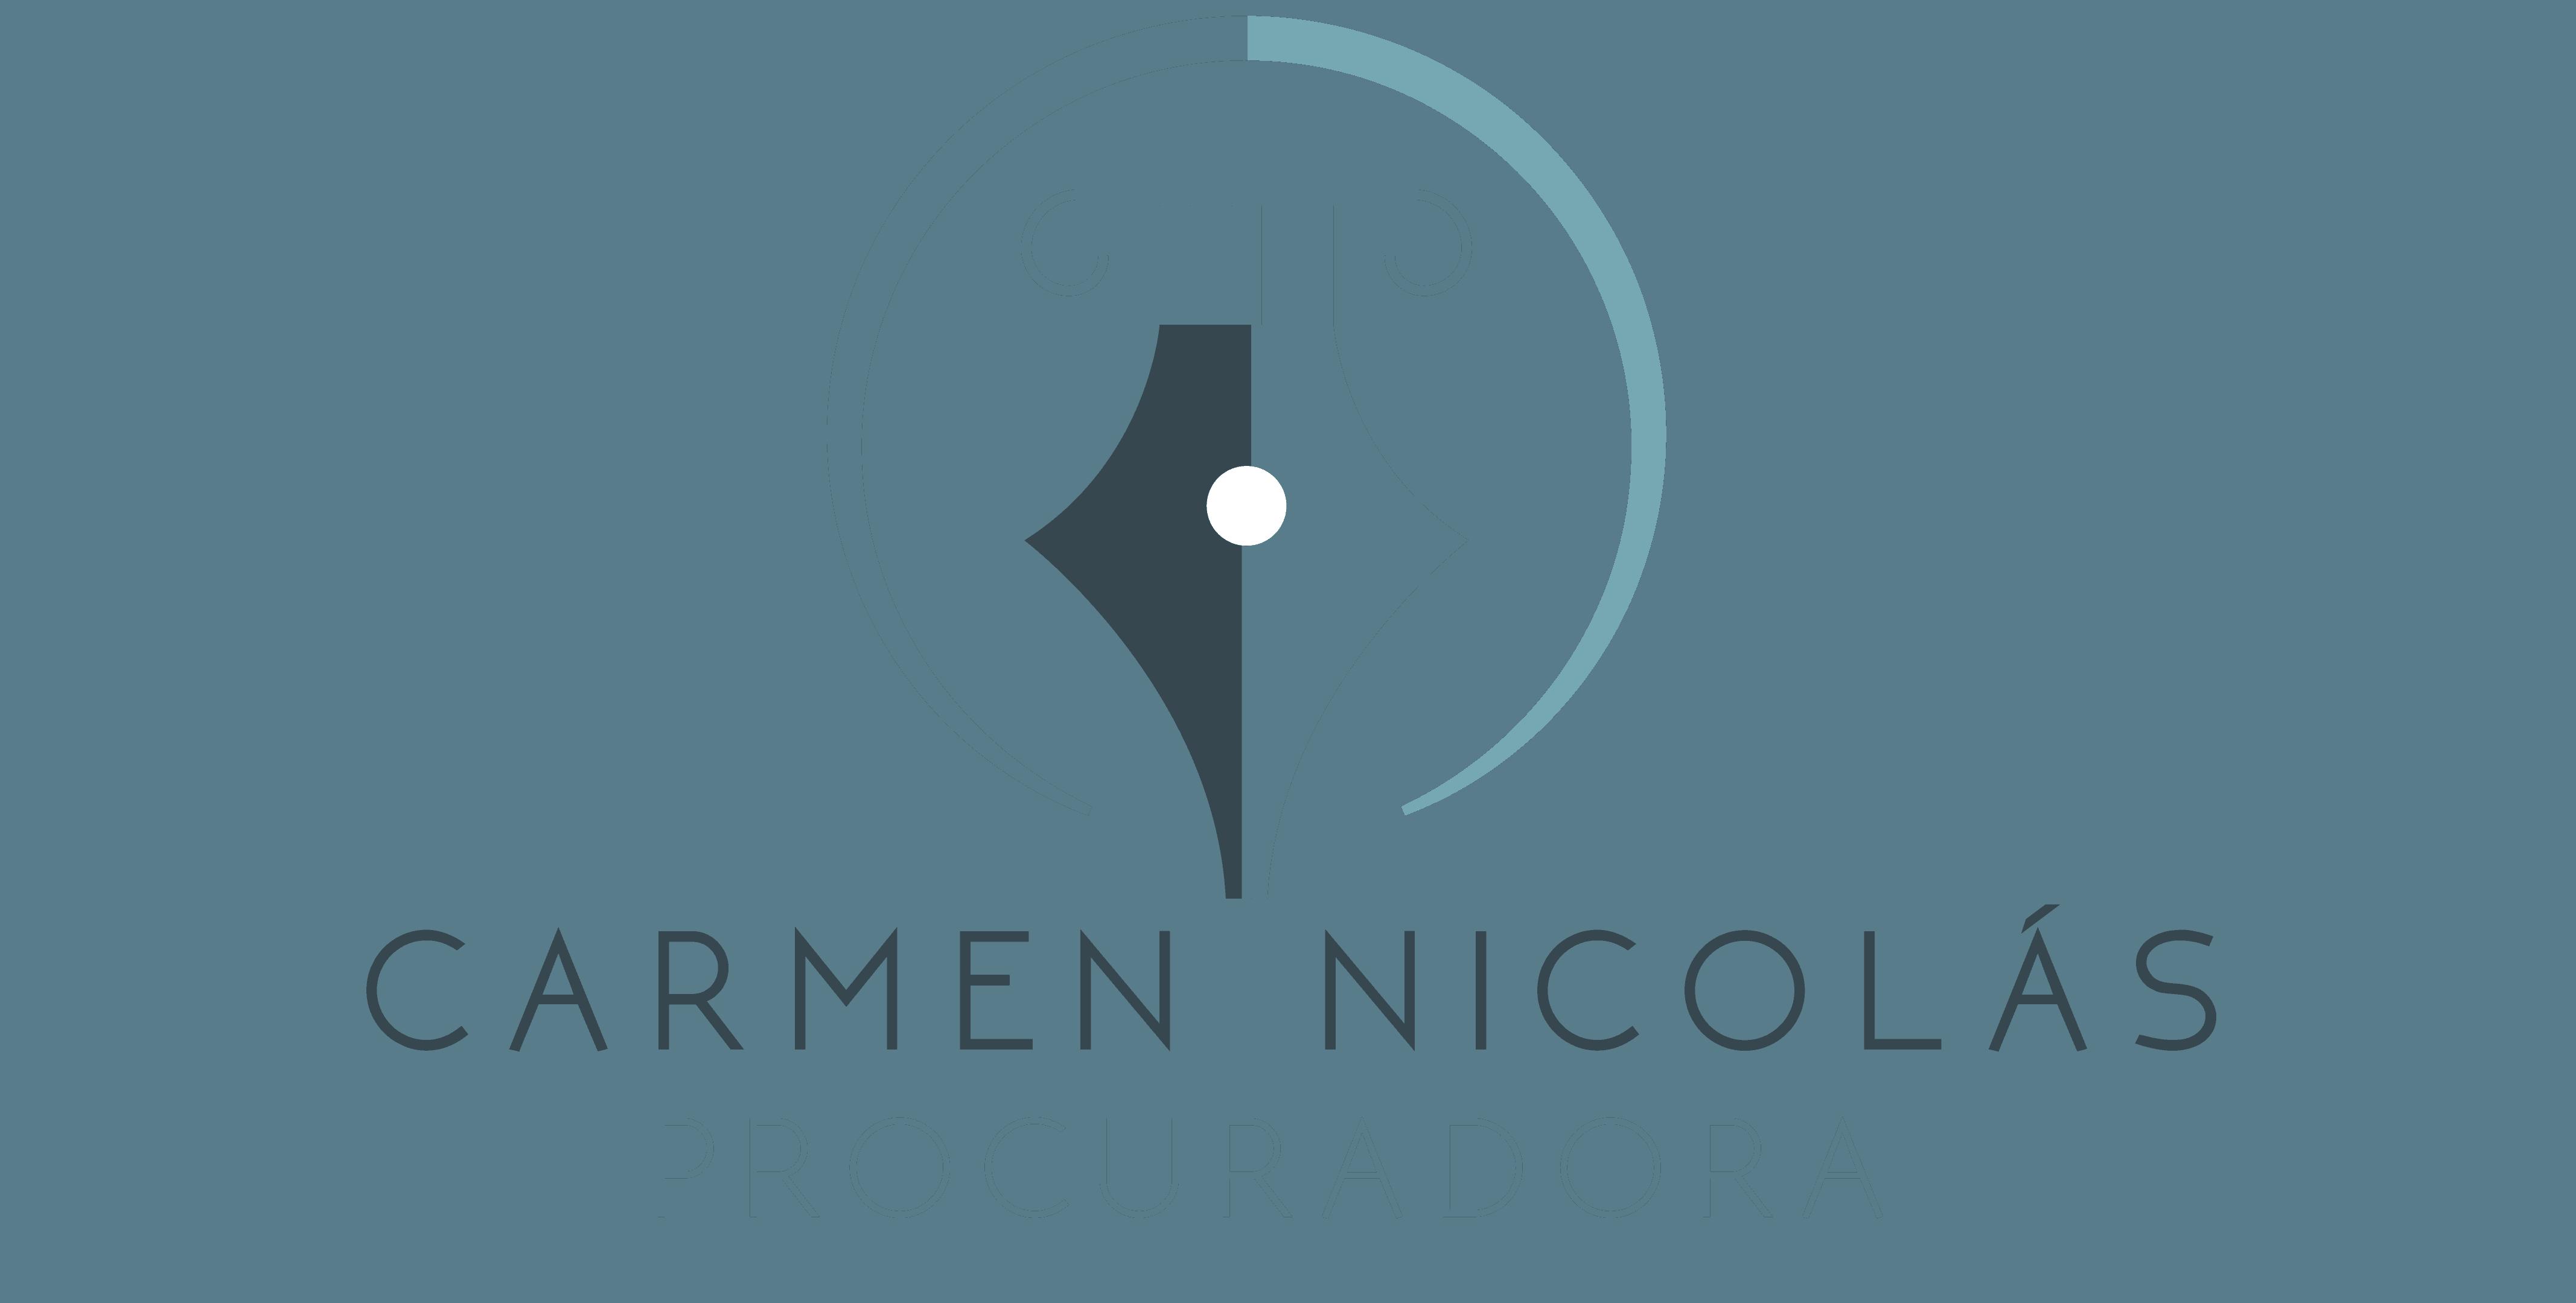 Carmen Nicolás tu procuradora. Facilitamos tu trabajo.